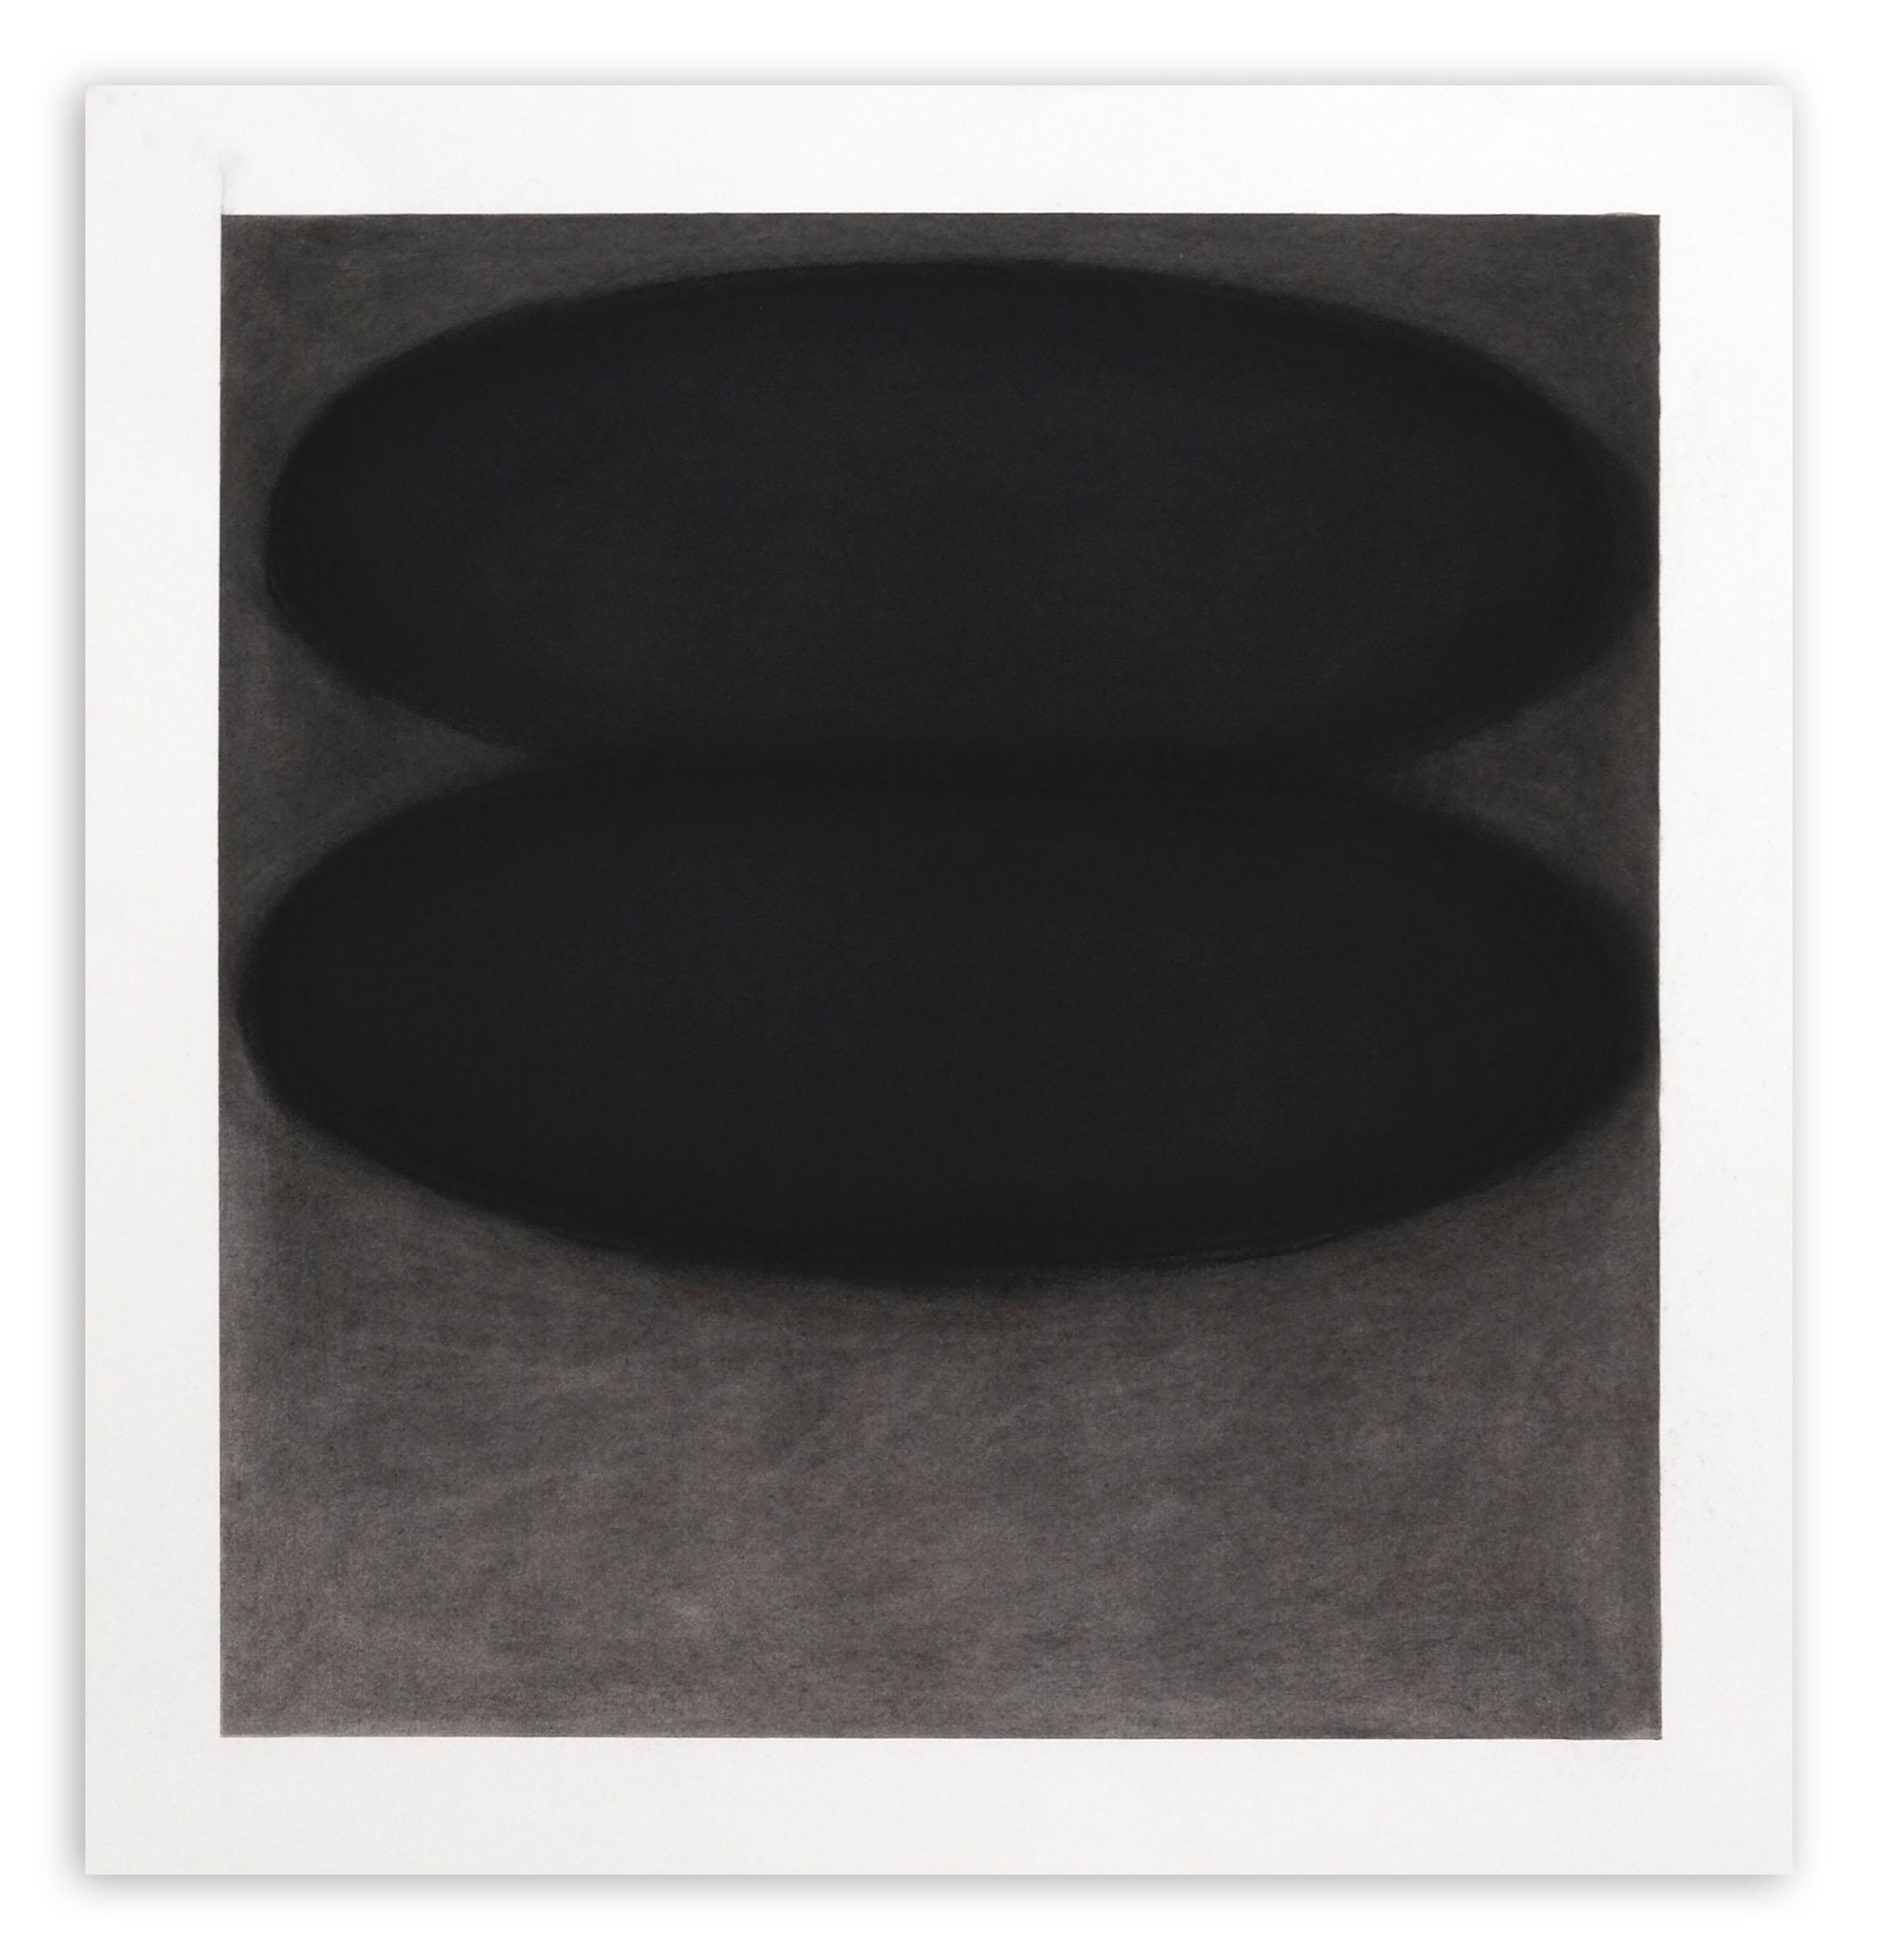 Intermezzo 5 (Abstract drawing)